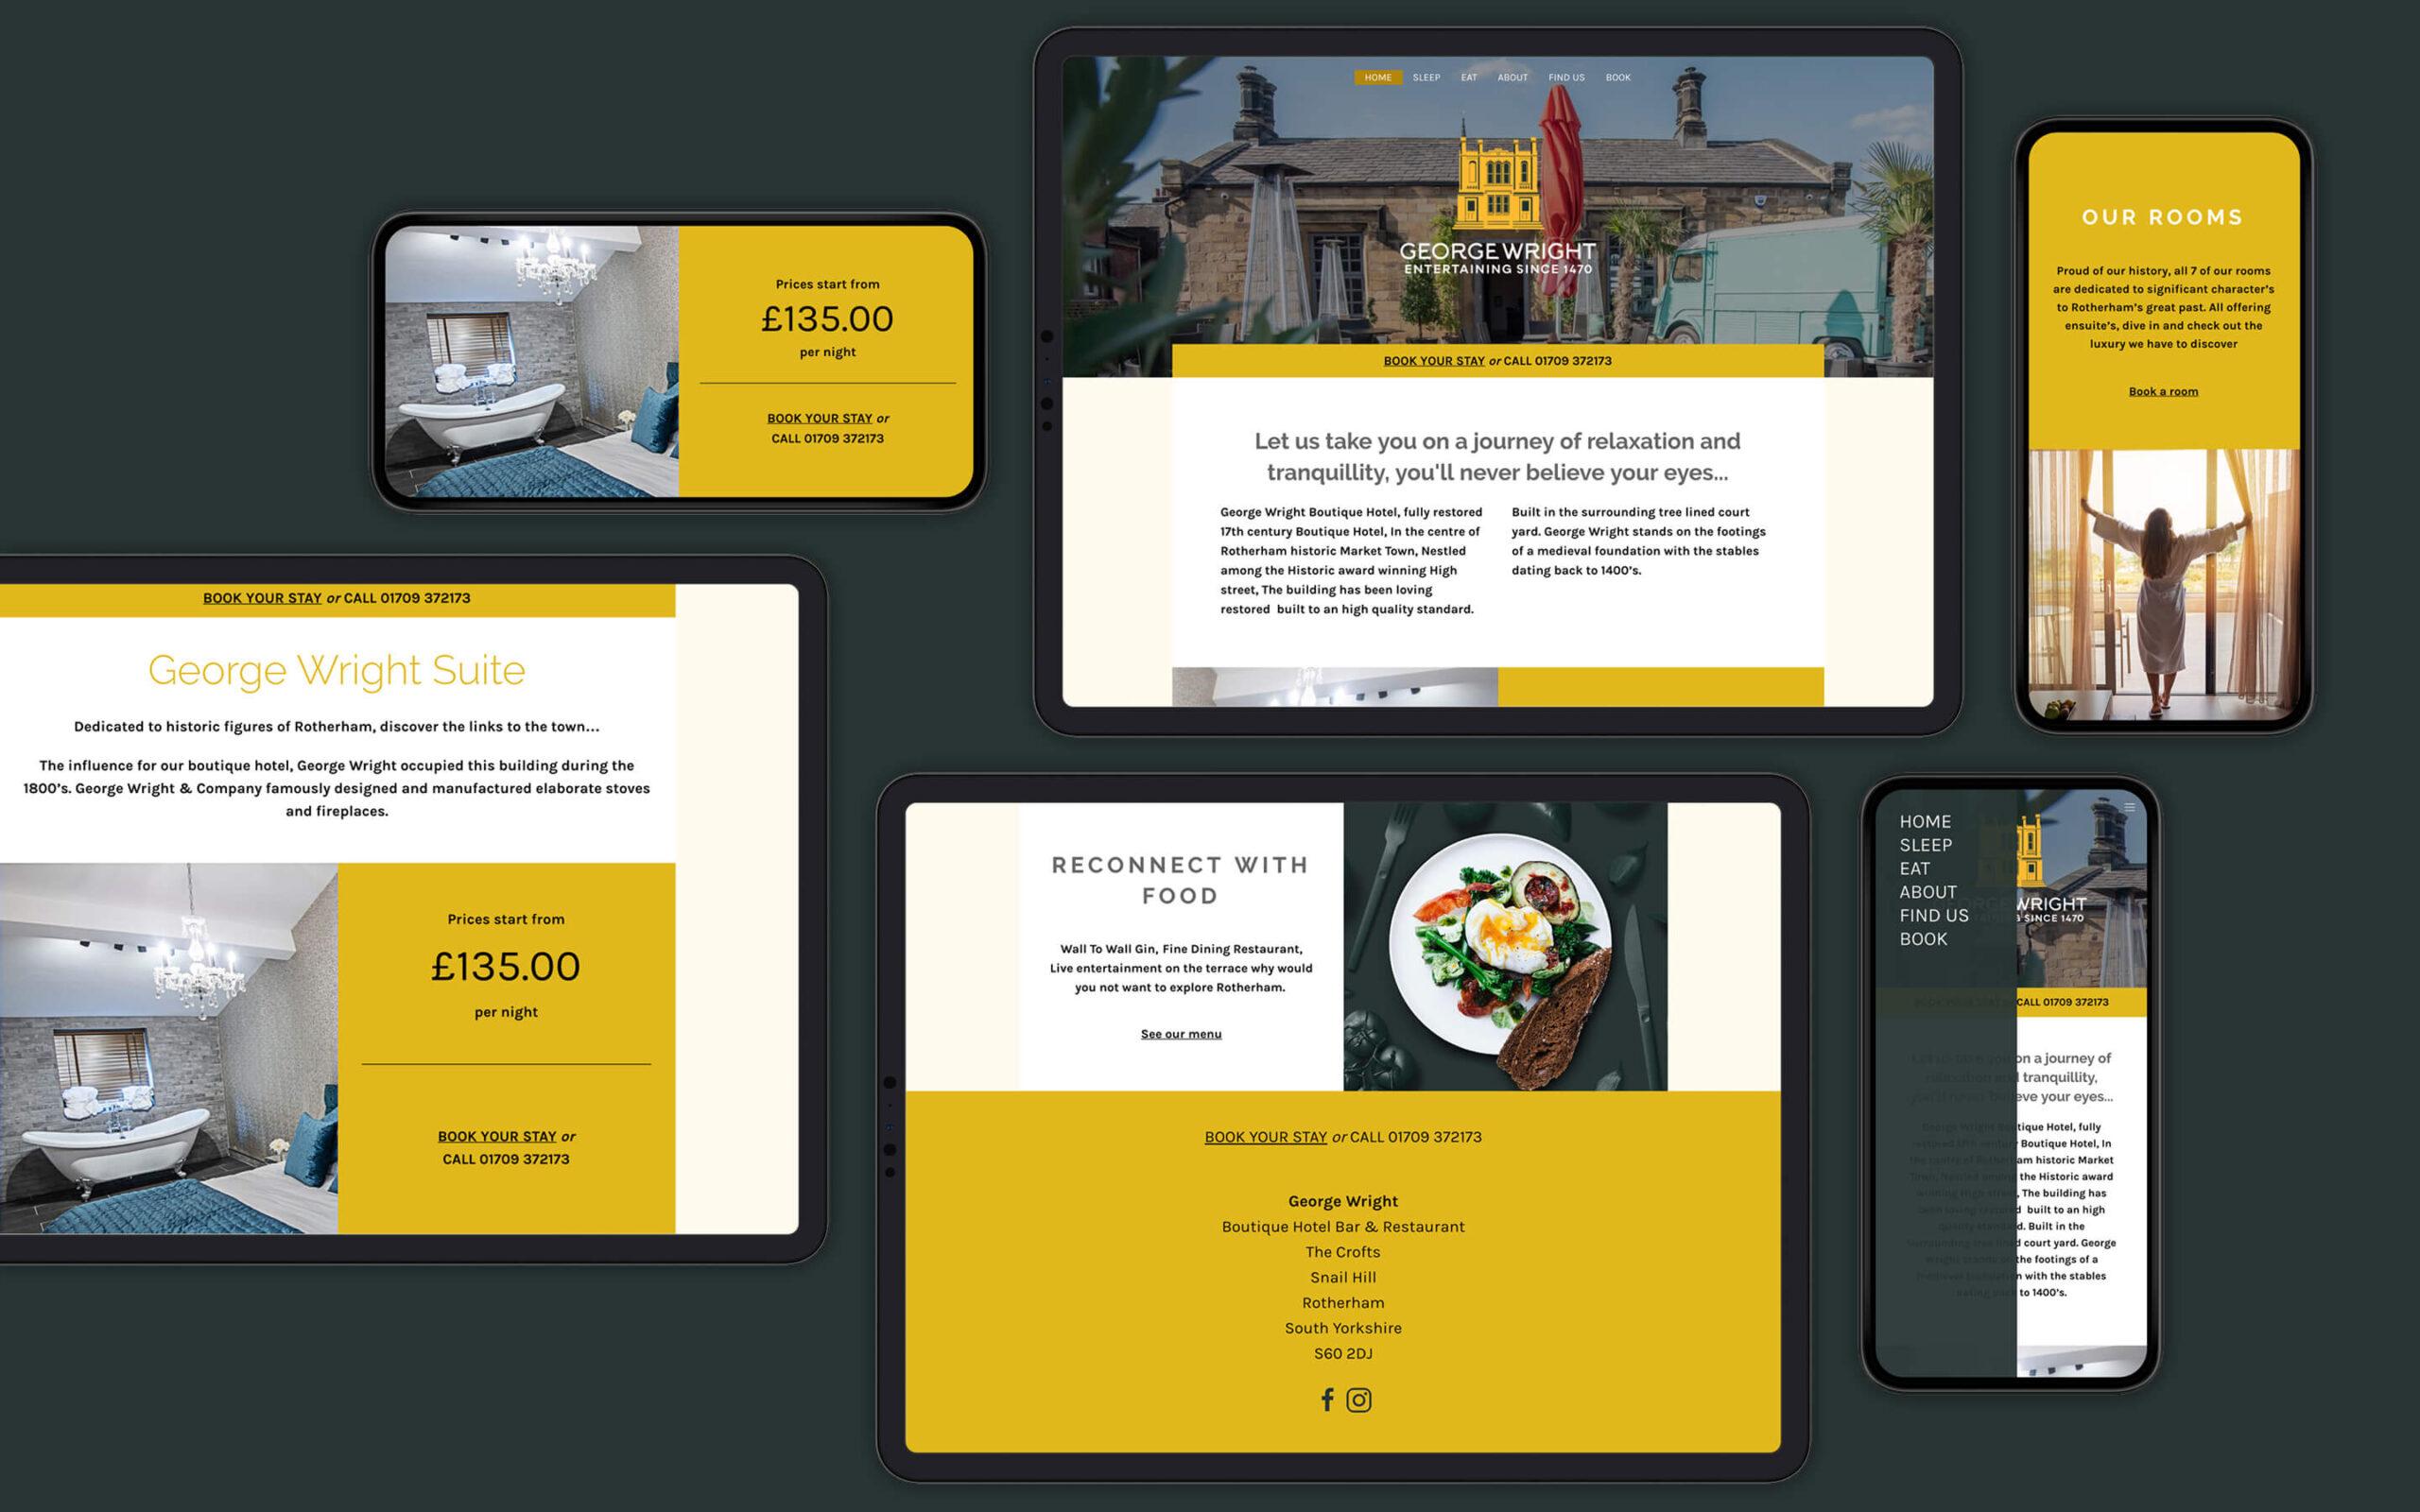 PWD-Brand-Presentation-George-Wright-Boutique-Hotel9-2